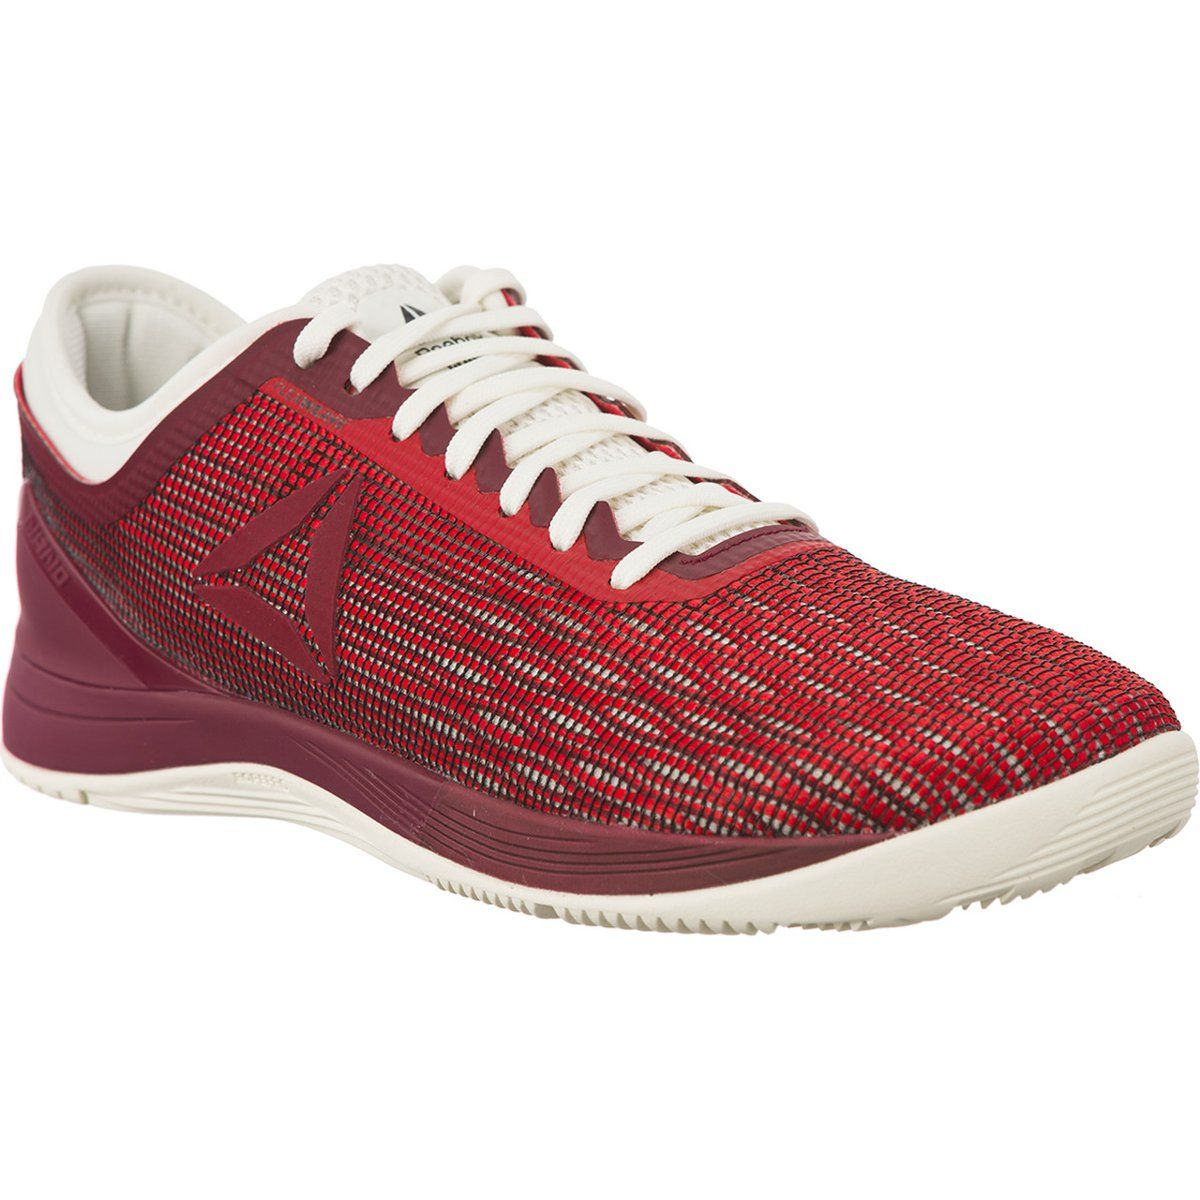 Sportowe Damskie Reebok Reebok Czerwone R Crossfit Nano 8 0 Cm9172 Reebok Shoes Sneakers